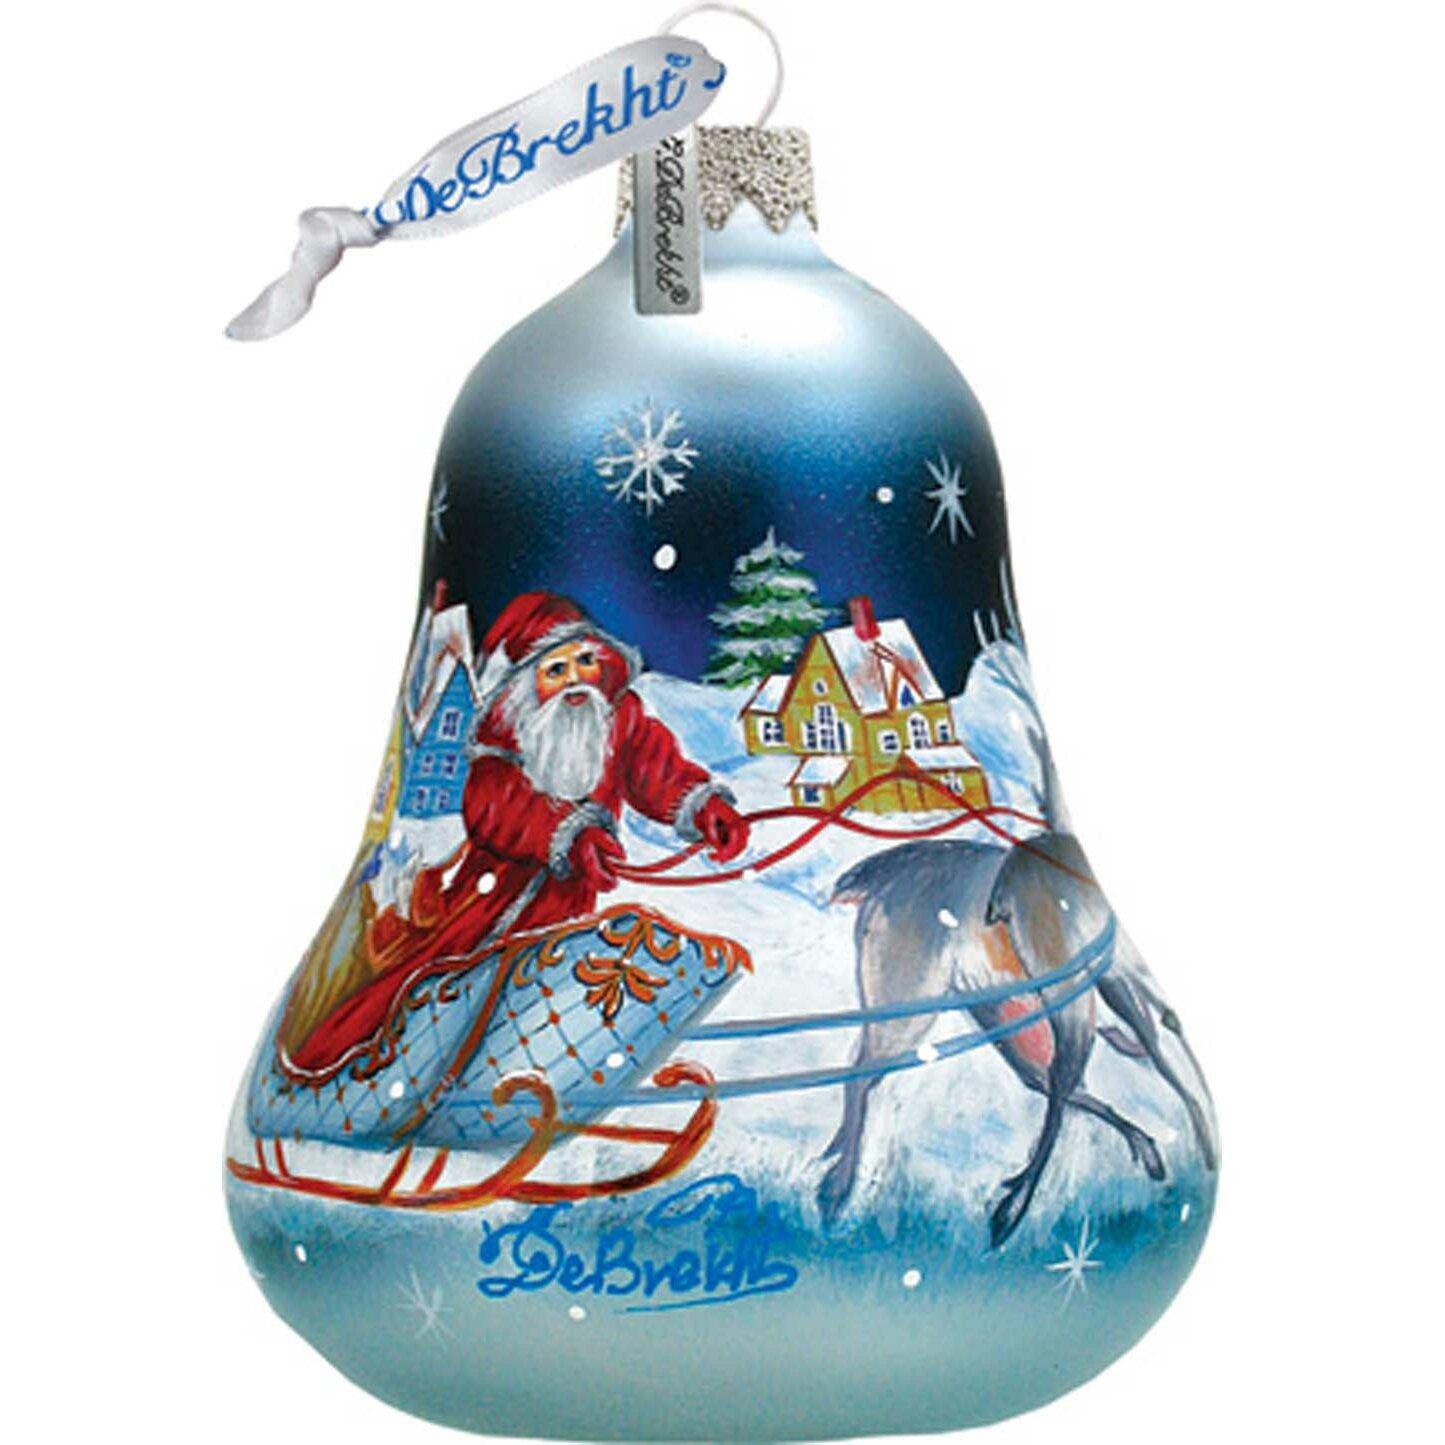 G debrekht santa sleigh bell ornament reviews wayfair